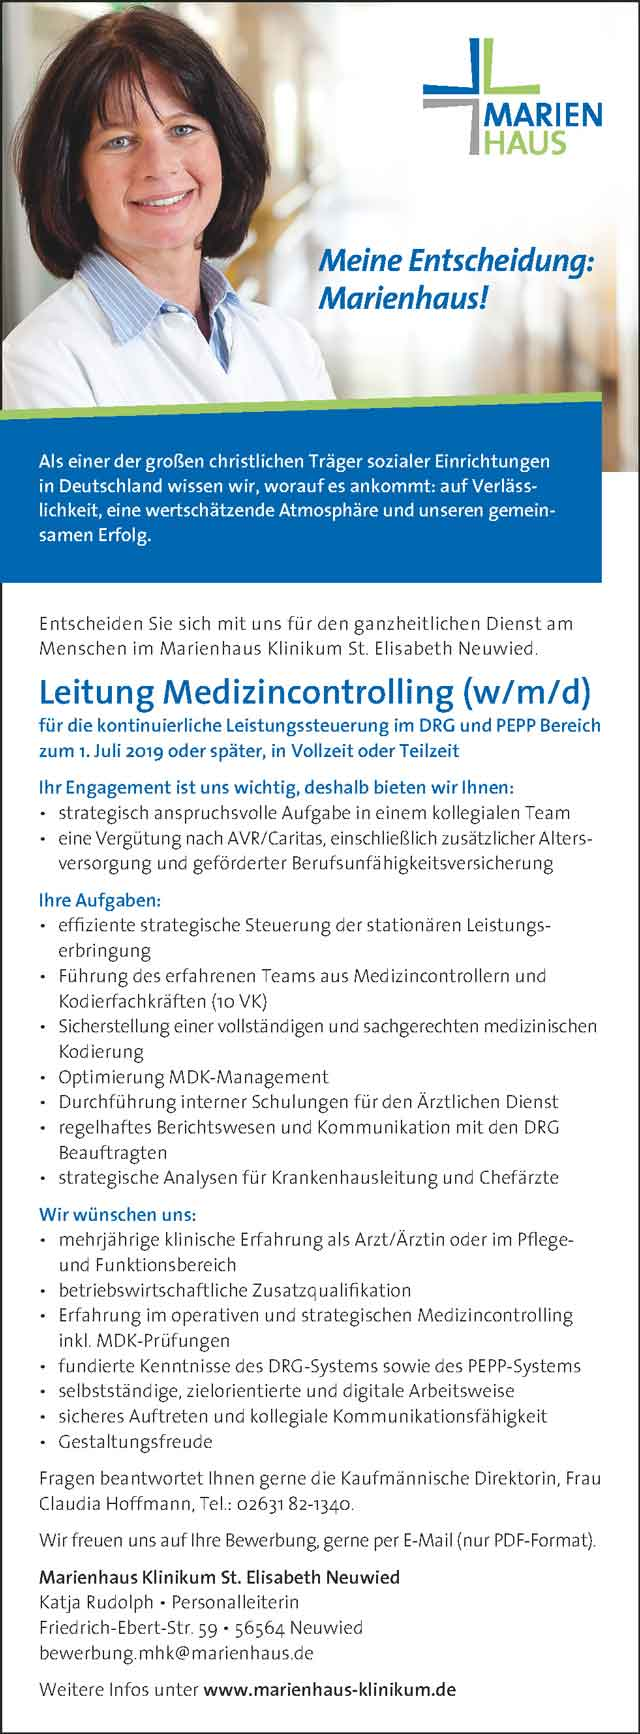 Marienhaus Klinikum St. Elisabeth Neuwied: Leitung Medizincontrolling (w/m/d)